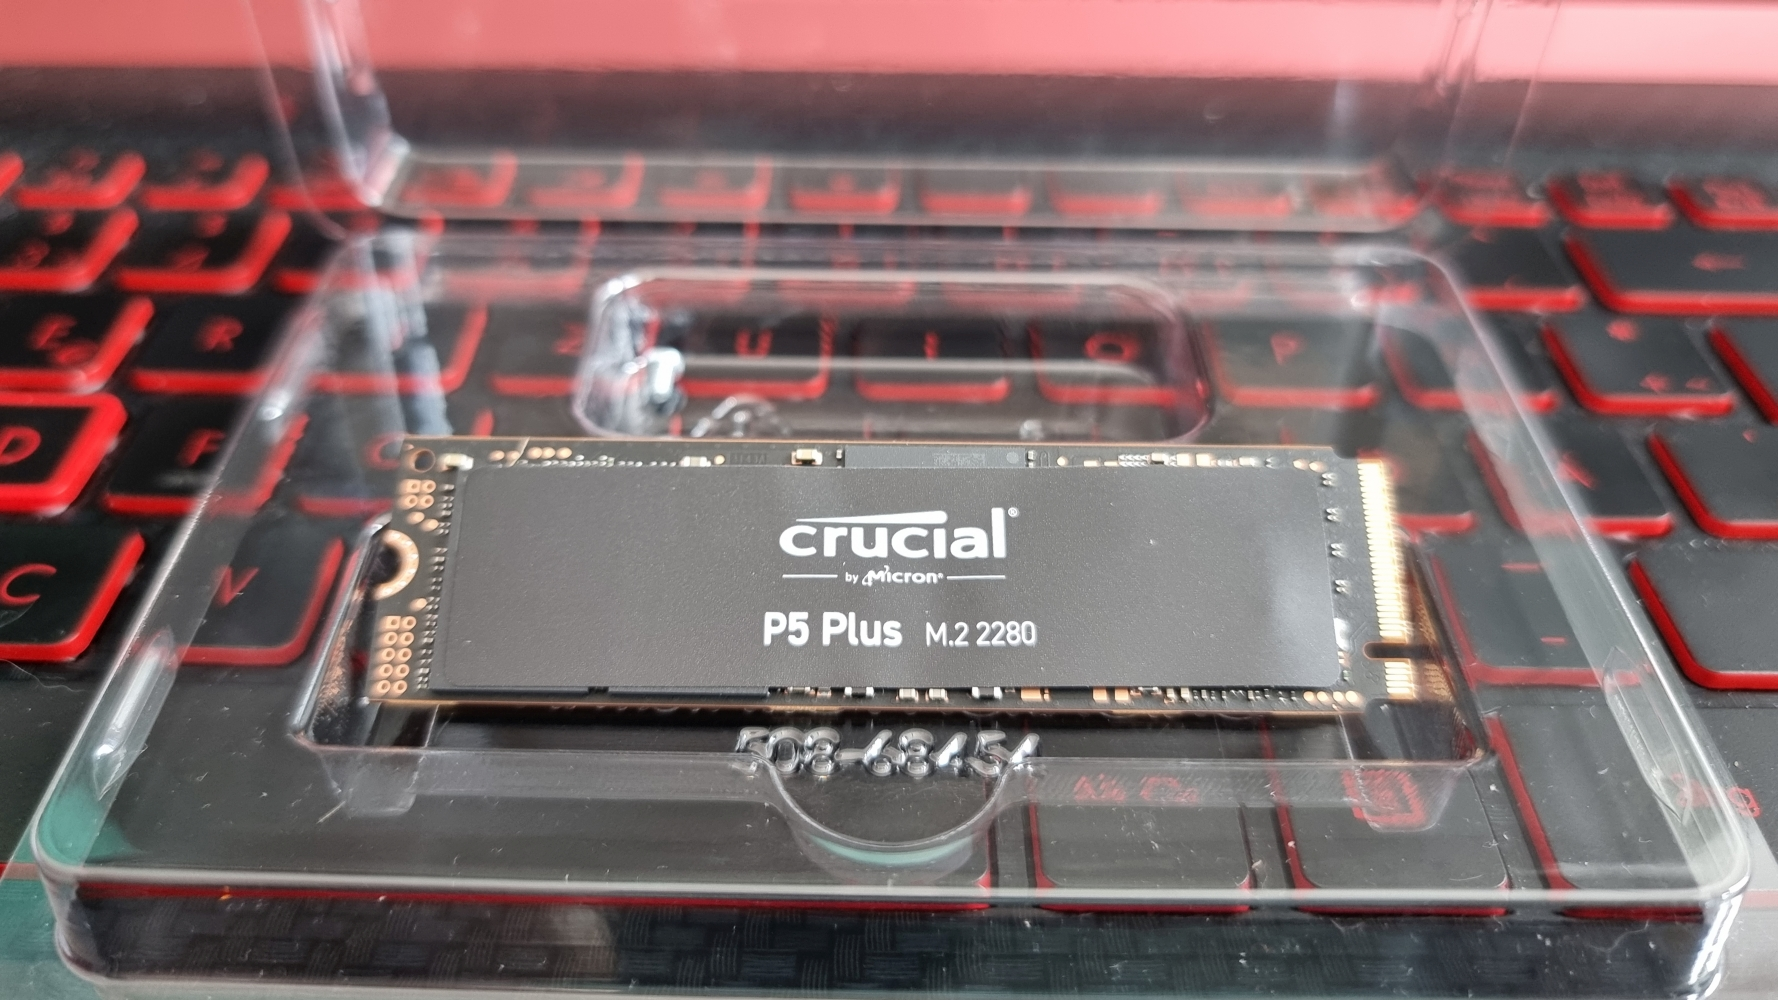 PlayStation 5 M.2 NVME PCIe 4.0 SSD Crucial P5 Plus ohne Kühlkörper